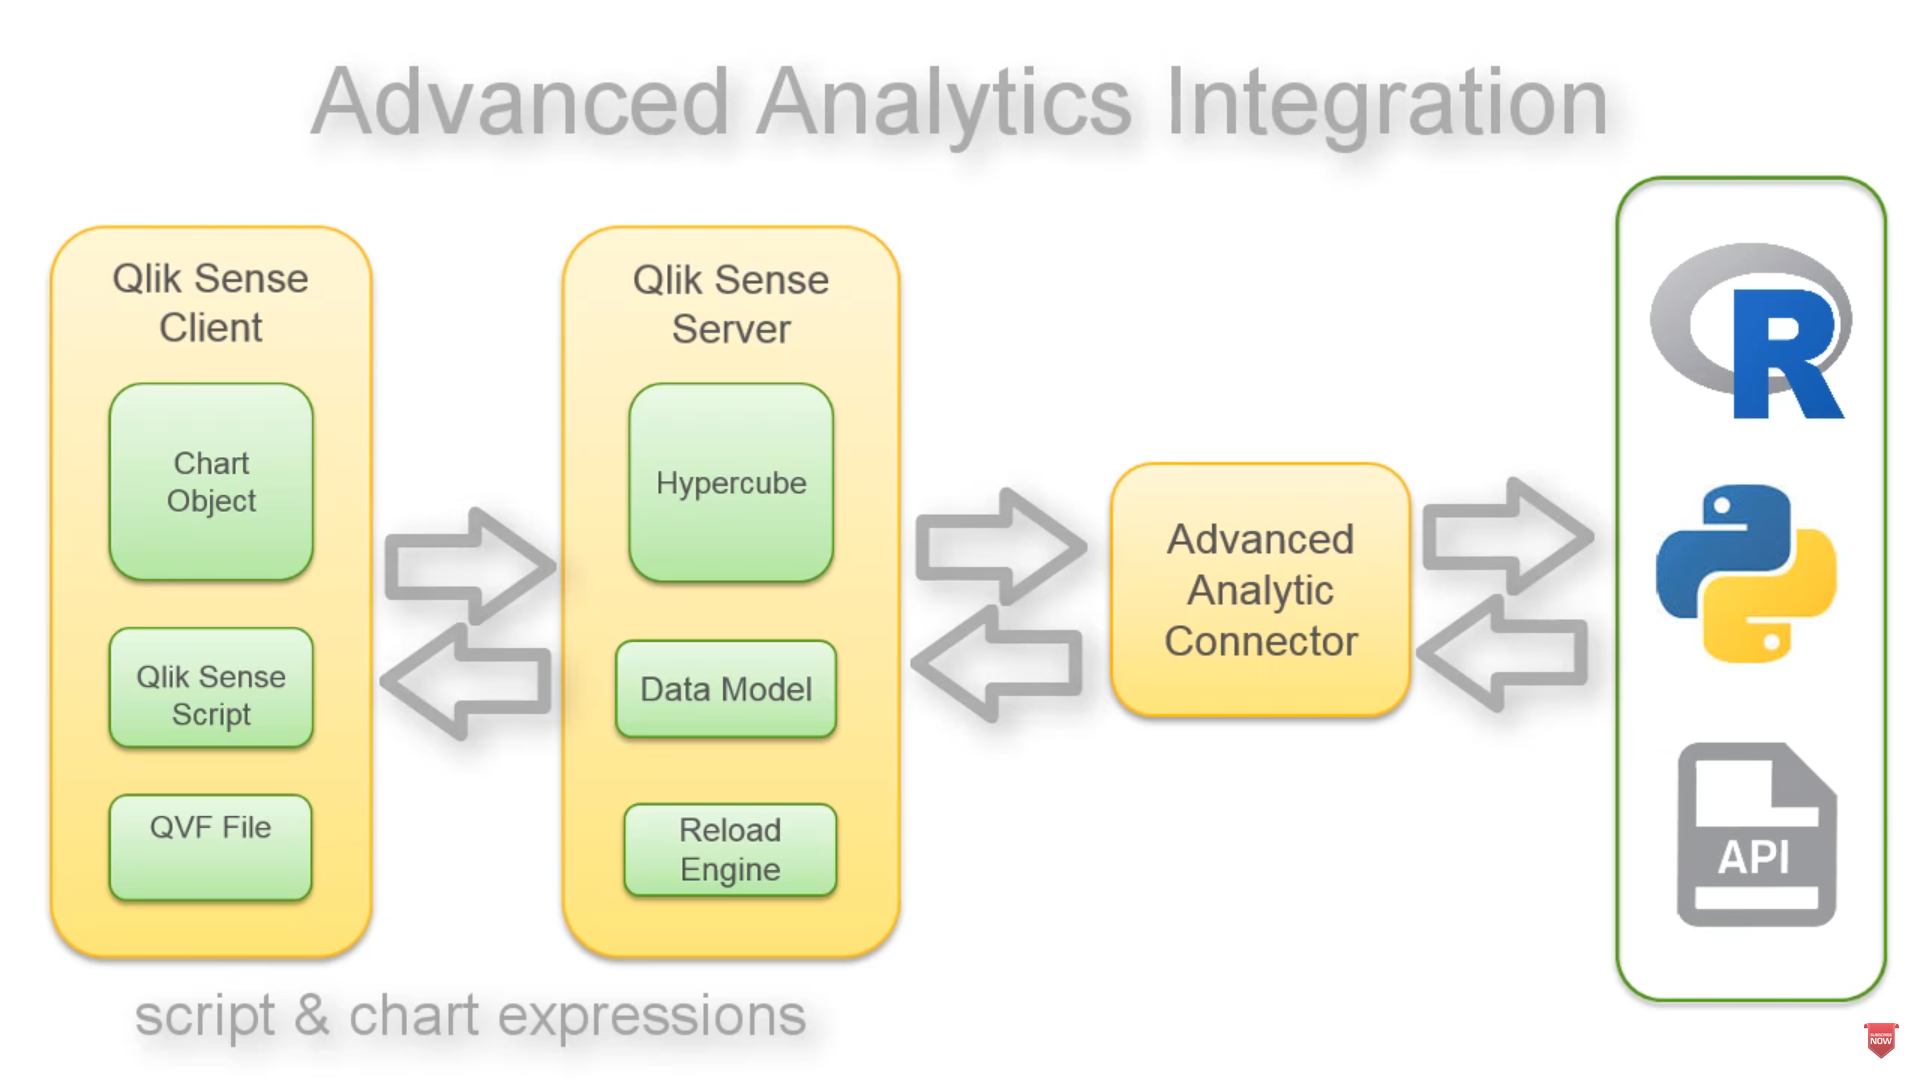 Introducing Qlik Advanced Analytics Integration - Qlik Community